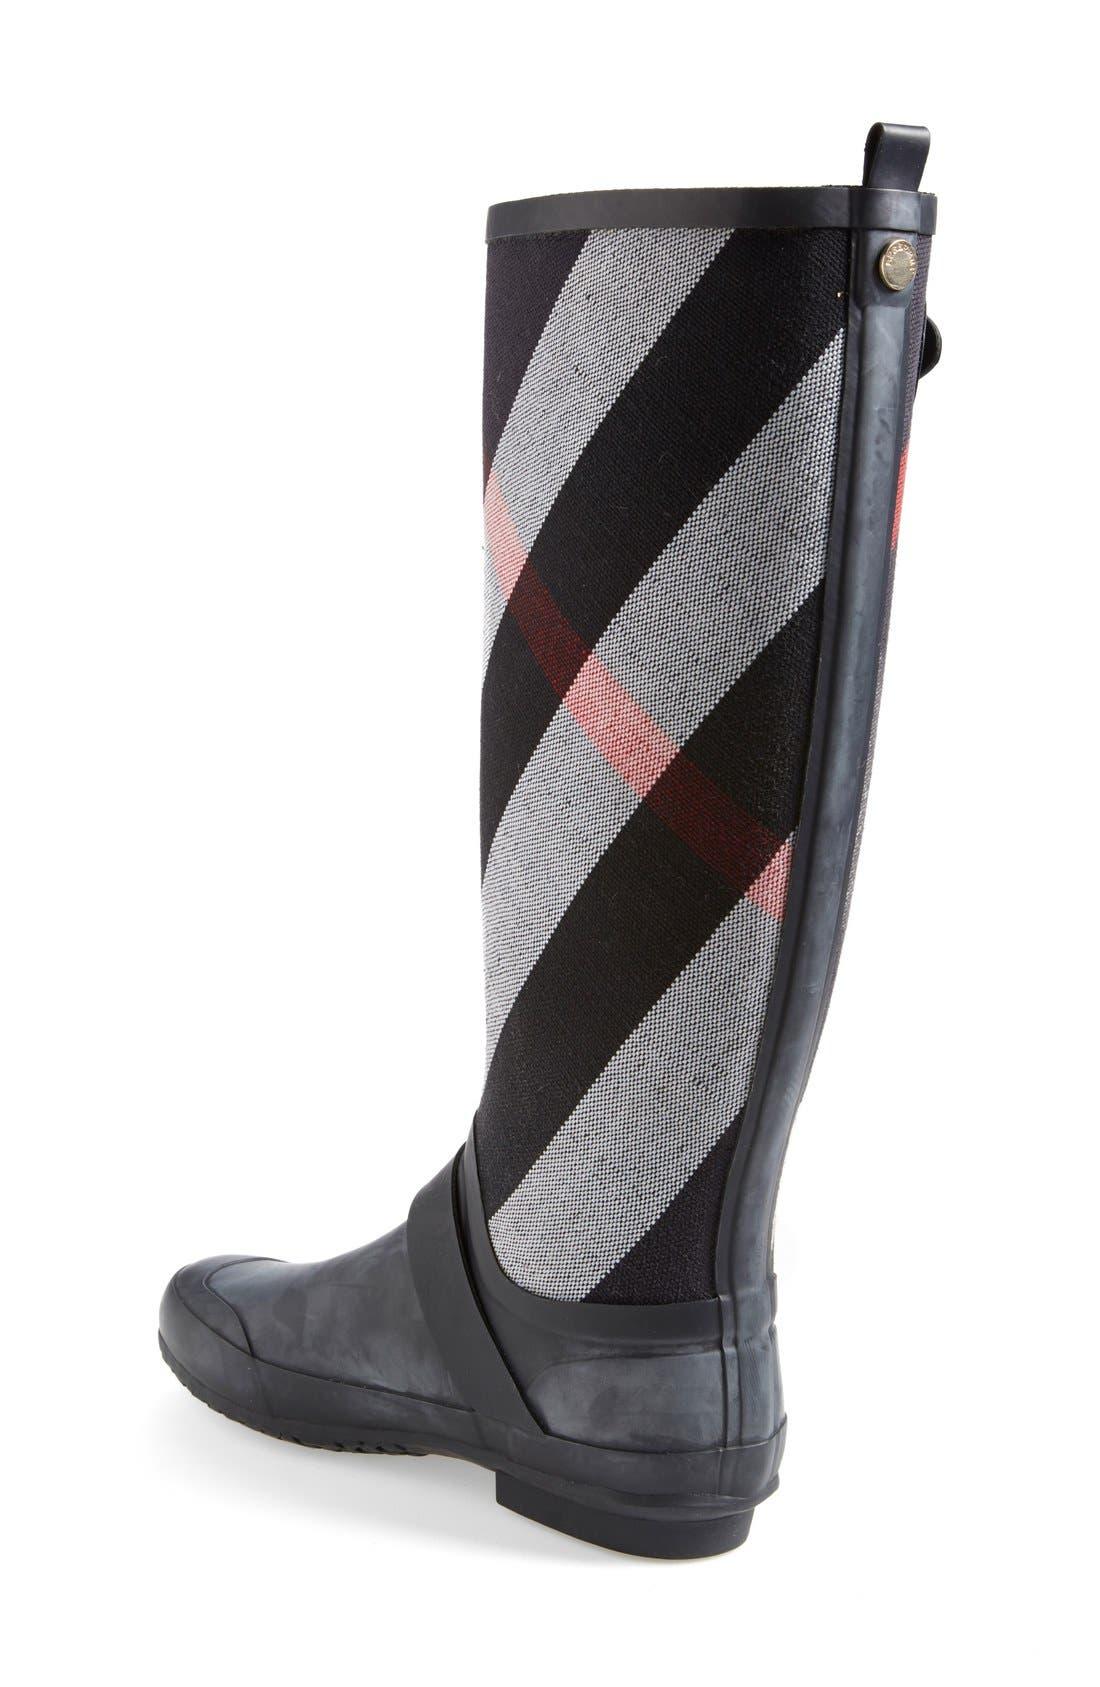 Alternate Image 2  - Burberry 'Birkback' Rain Boot (Women) (Wide Calf)